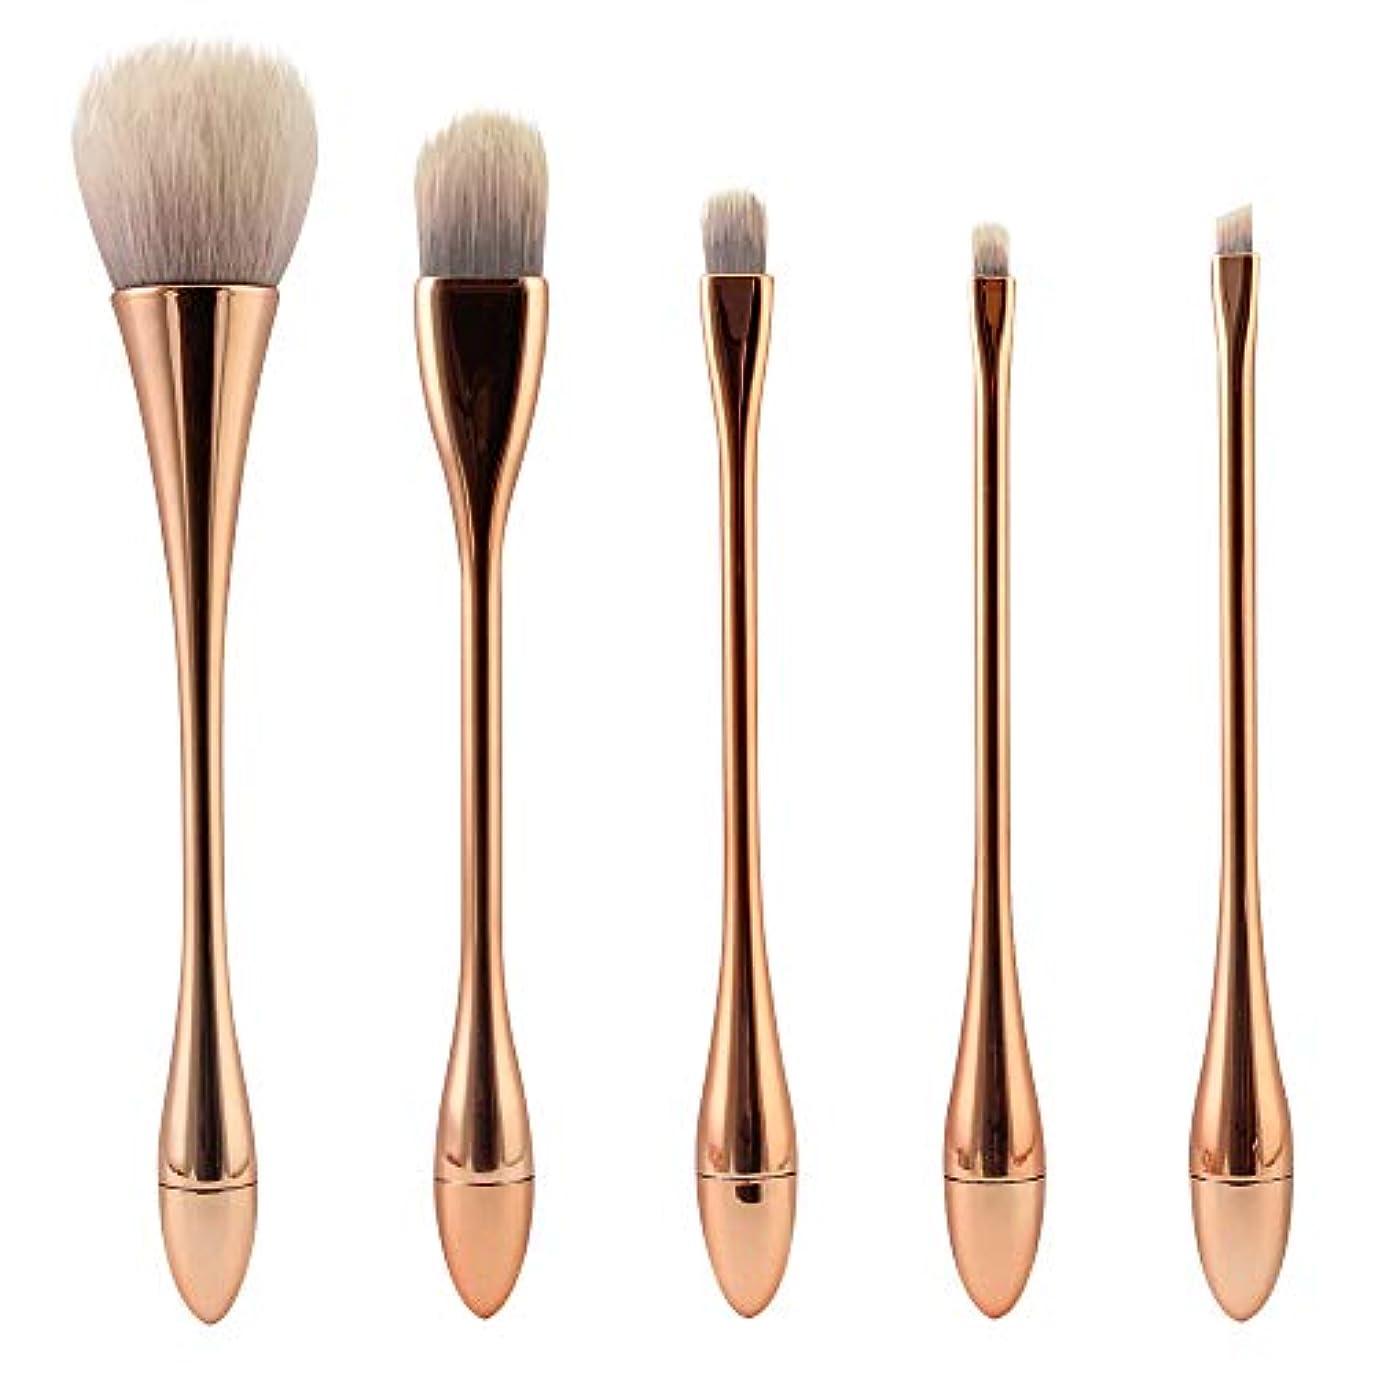 SUPER DREAM メイクブラシ 5セット 化粧ブラシセット 化粧筆 フェイスブラシ 全顔対応 高級ナイロン毛 超柔らかい メイク道具ブラシ